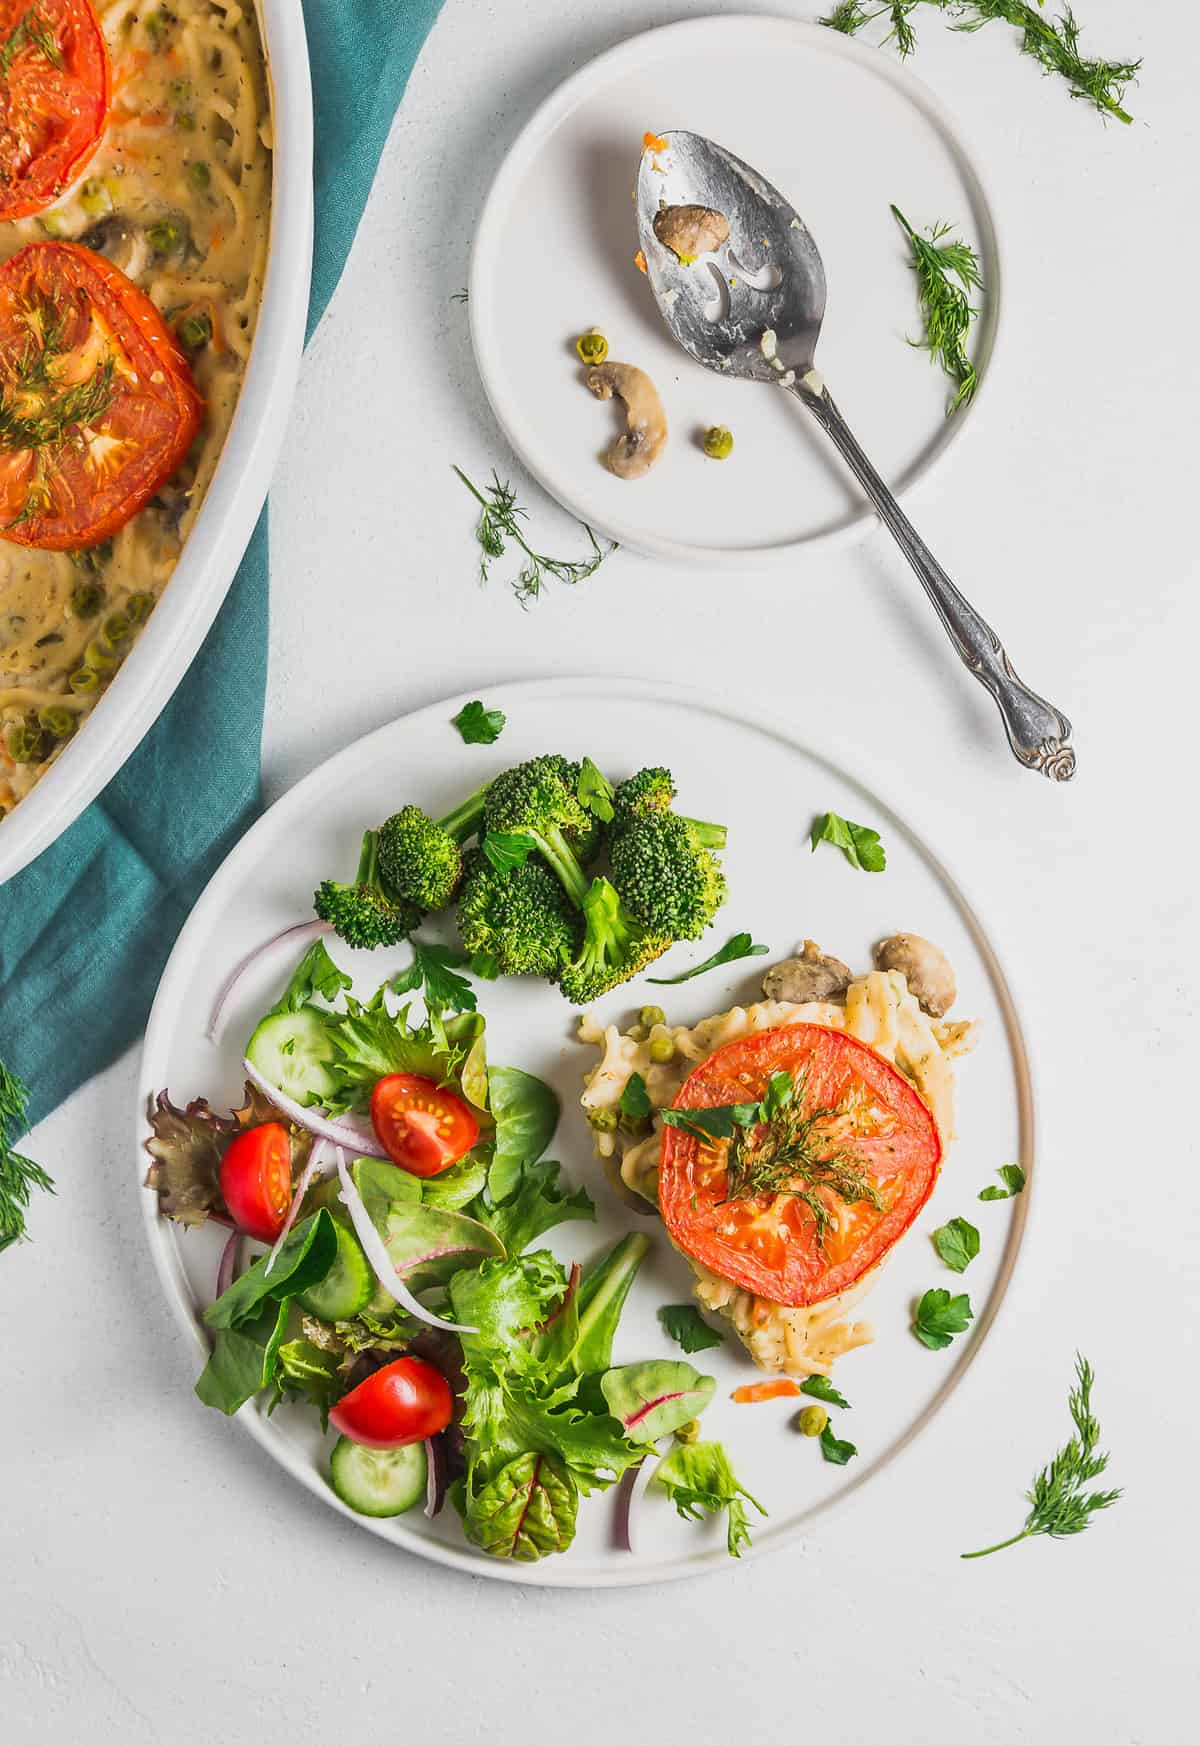 Spaghetti Pie, plant based, vegan, vegetarian, whole food plant based, gluten free, recipe, wfpb, healthy, healthy vegan, oil free, no refined sugar, no oil, refined sugar free, dairy free, dinner party, entertaining, dinner, lunch, pasta